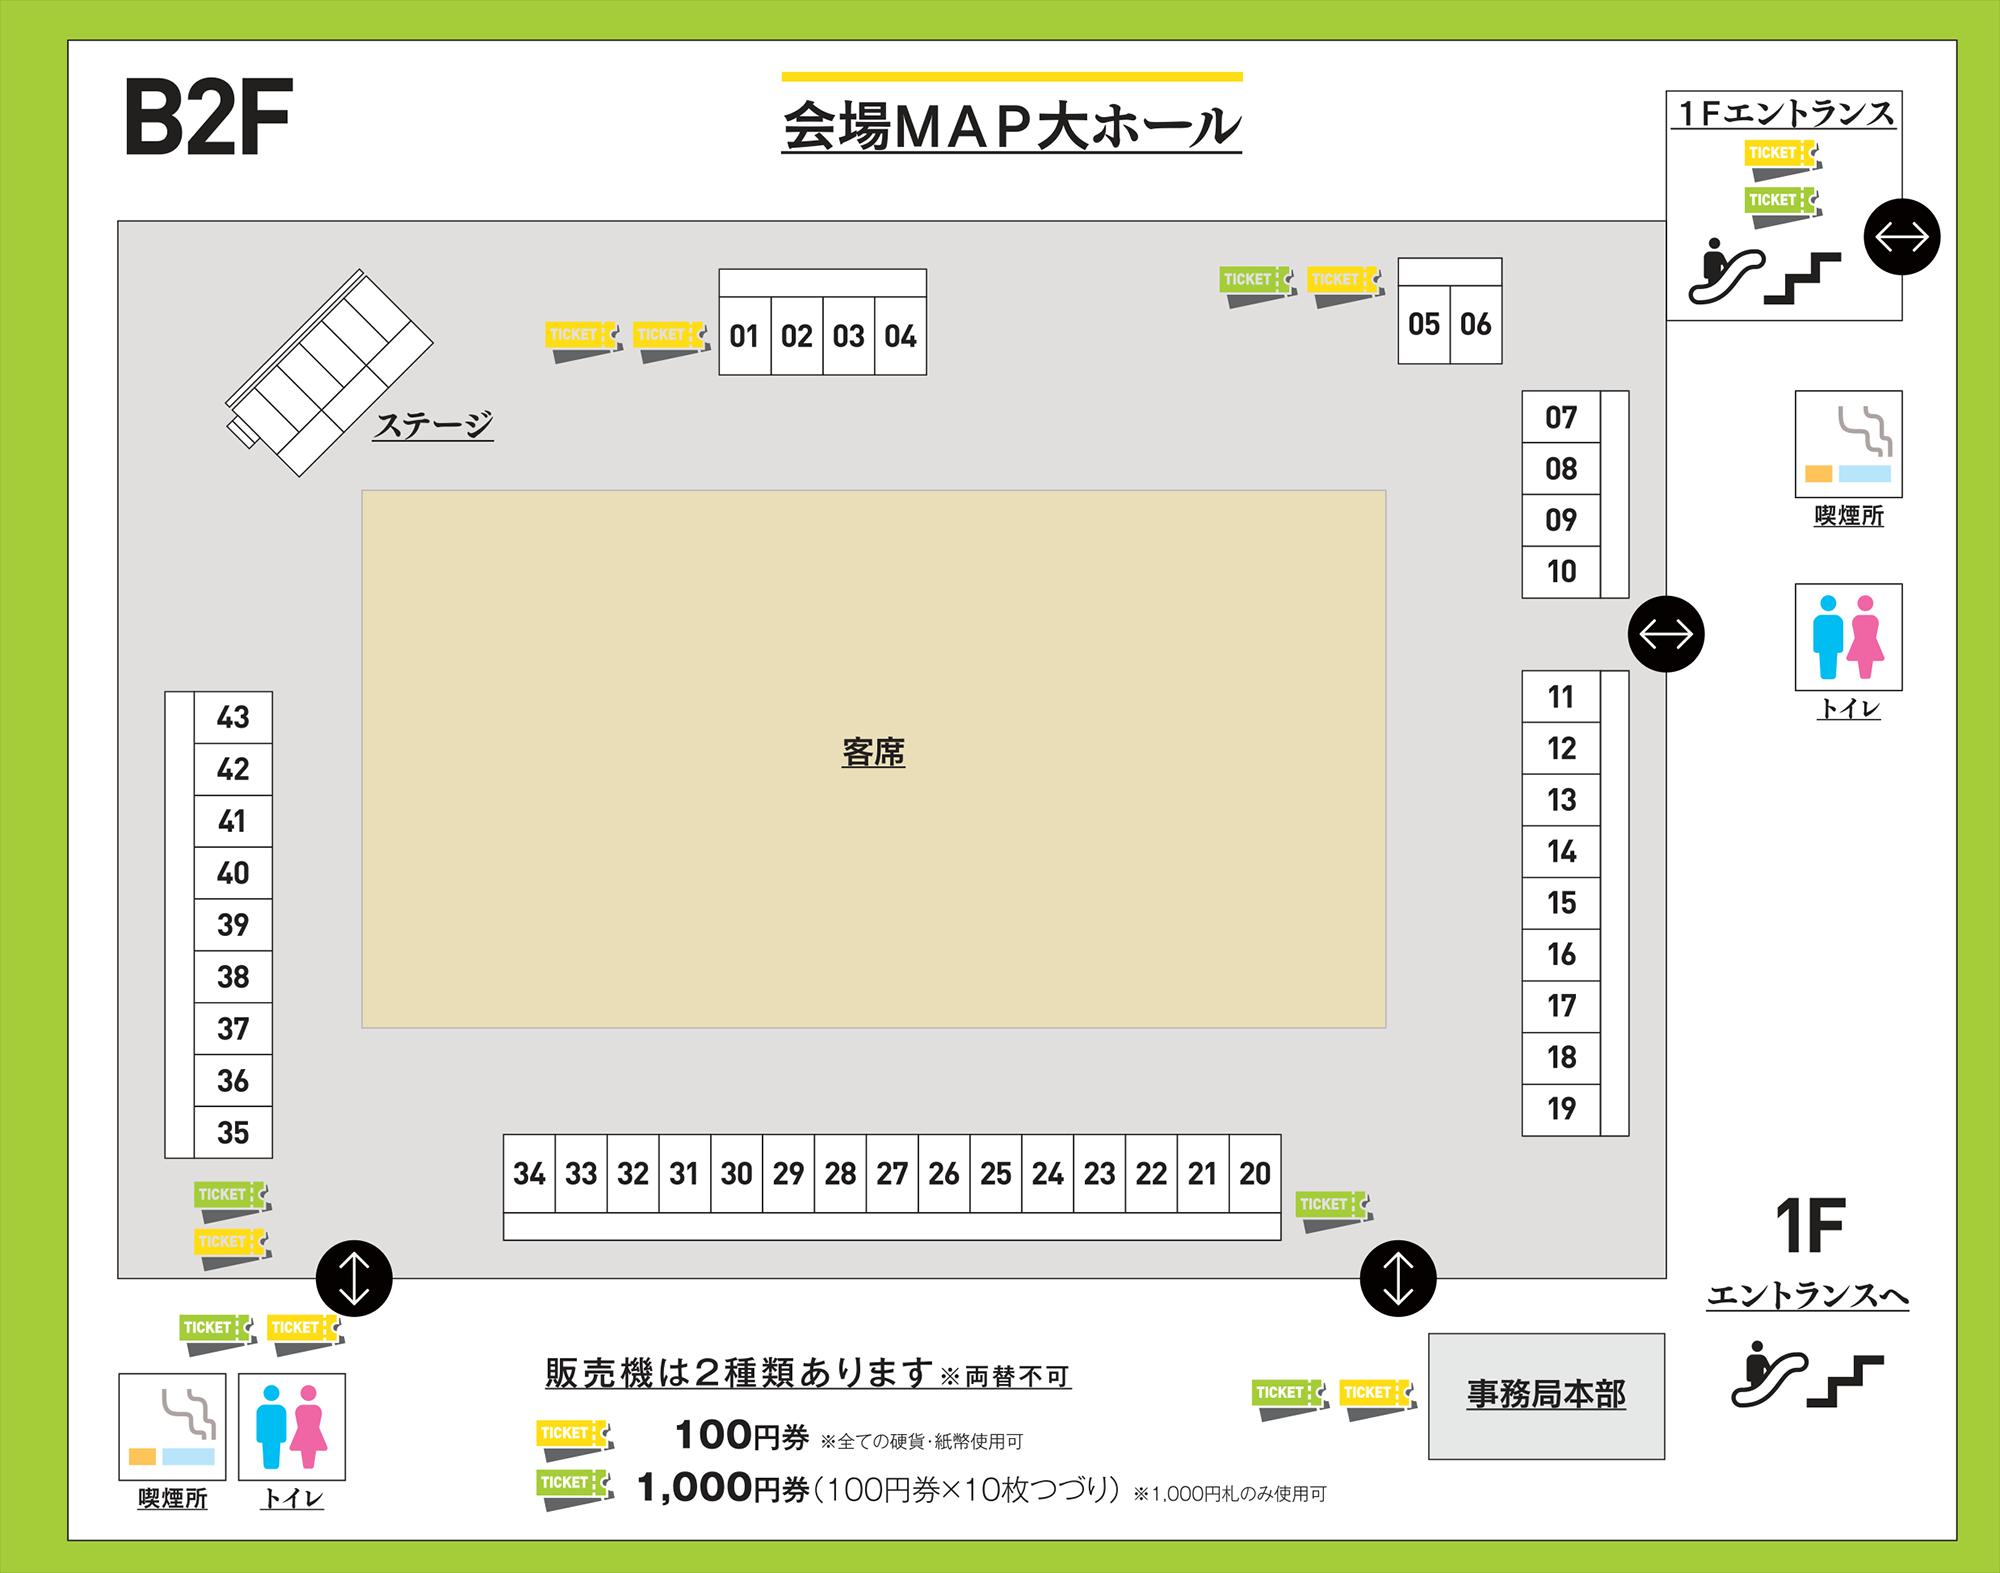 Craft Beer Shinshu Kaikin Event Map